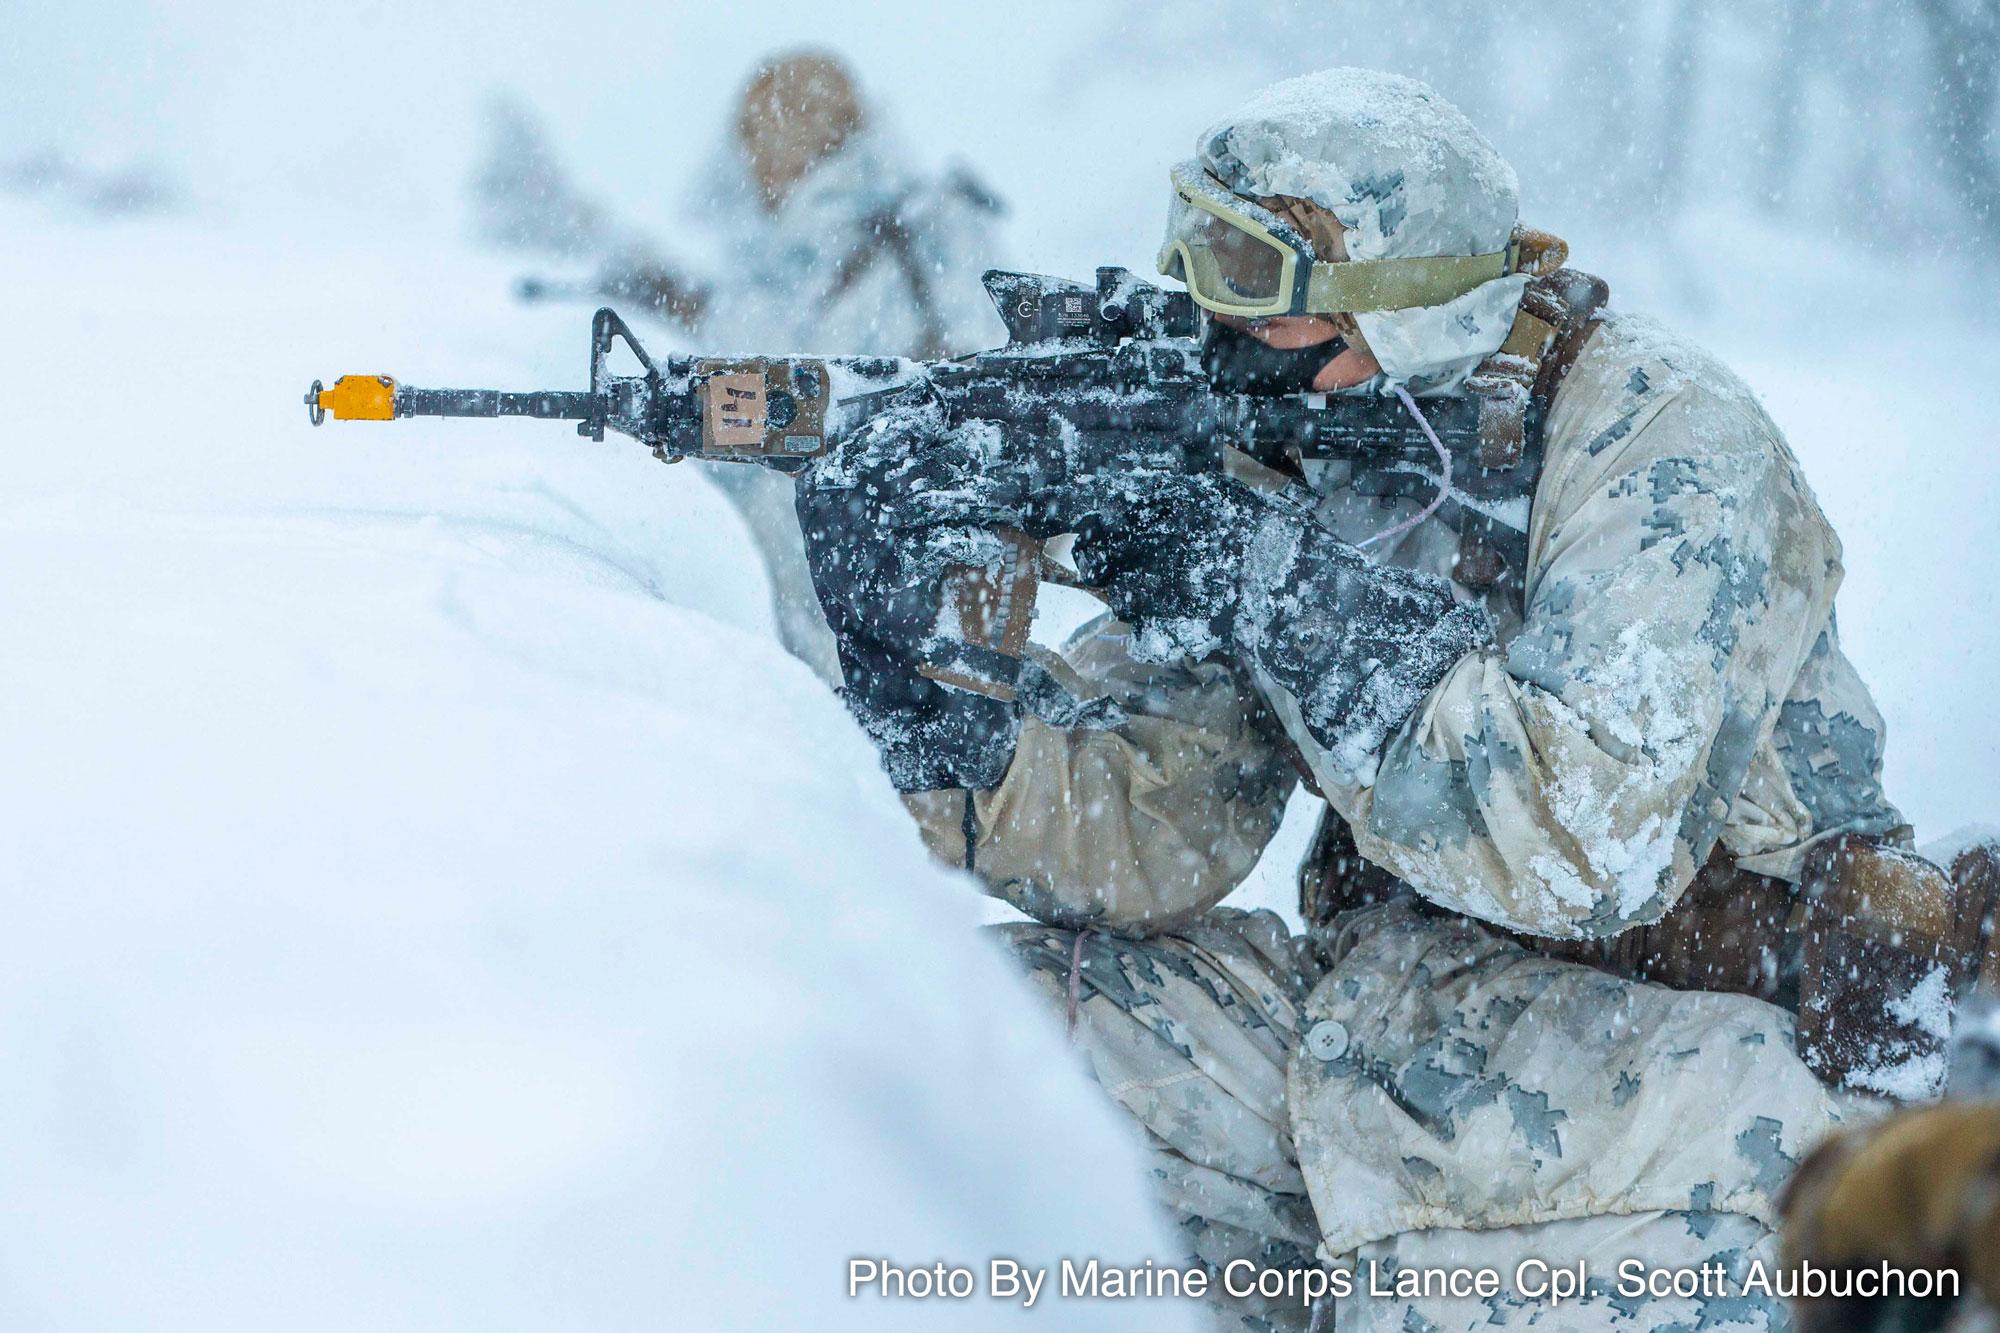 5-Photo-By-Marine-Corps-Lance-Cpl.-Scott-Aubuchon-2.jpg